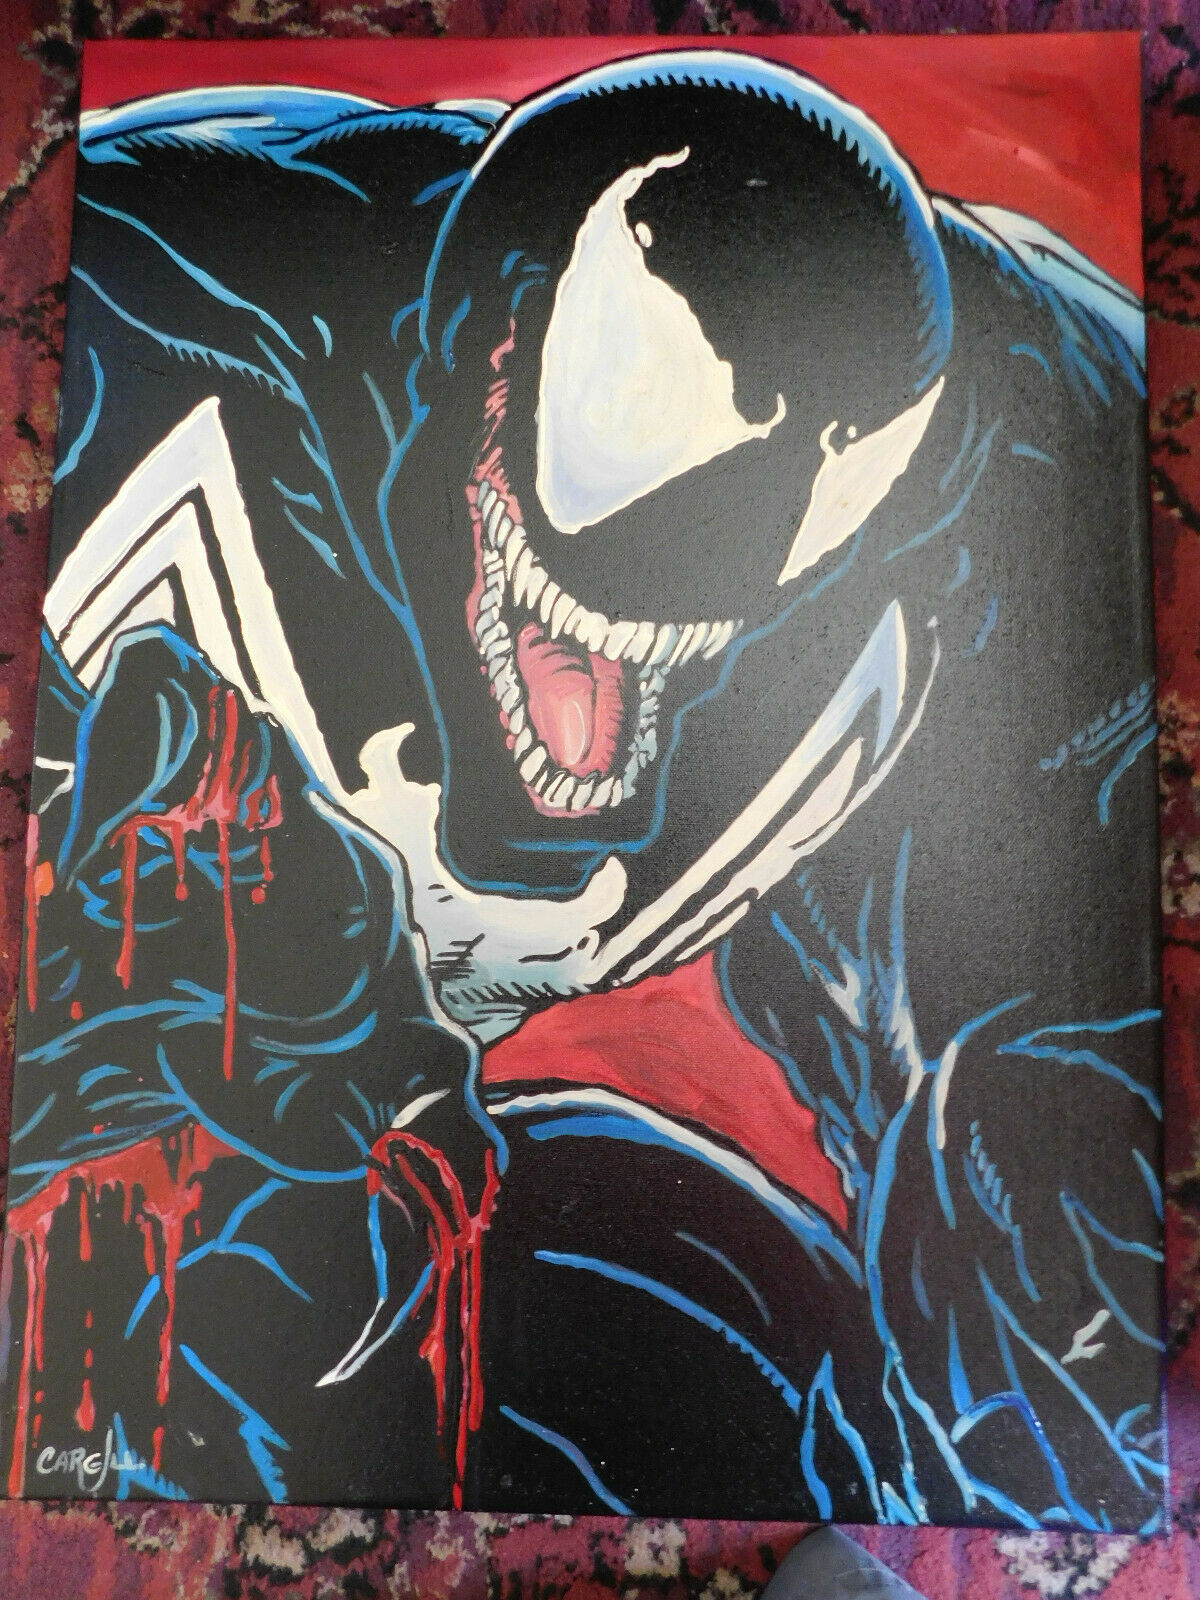 Marvel Venom ( Spider-man ) Hand Painted Art Canvas Signed